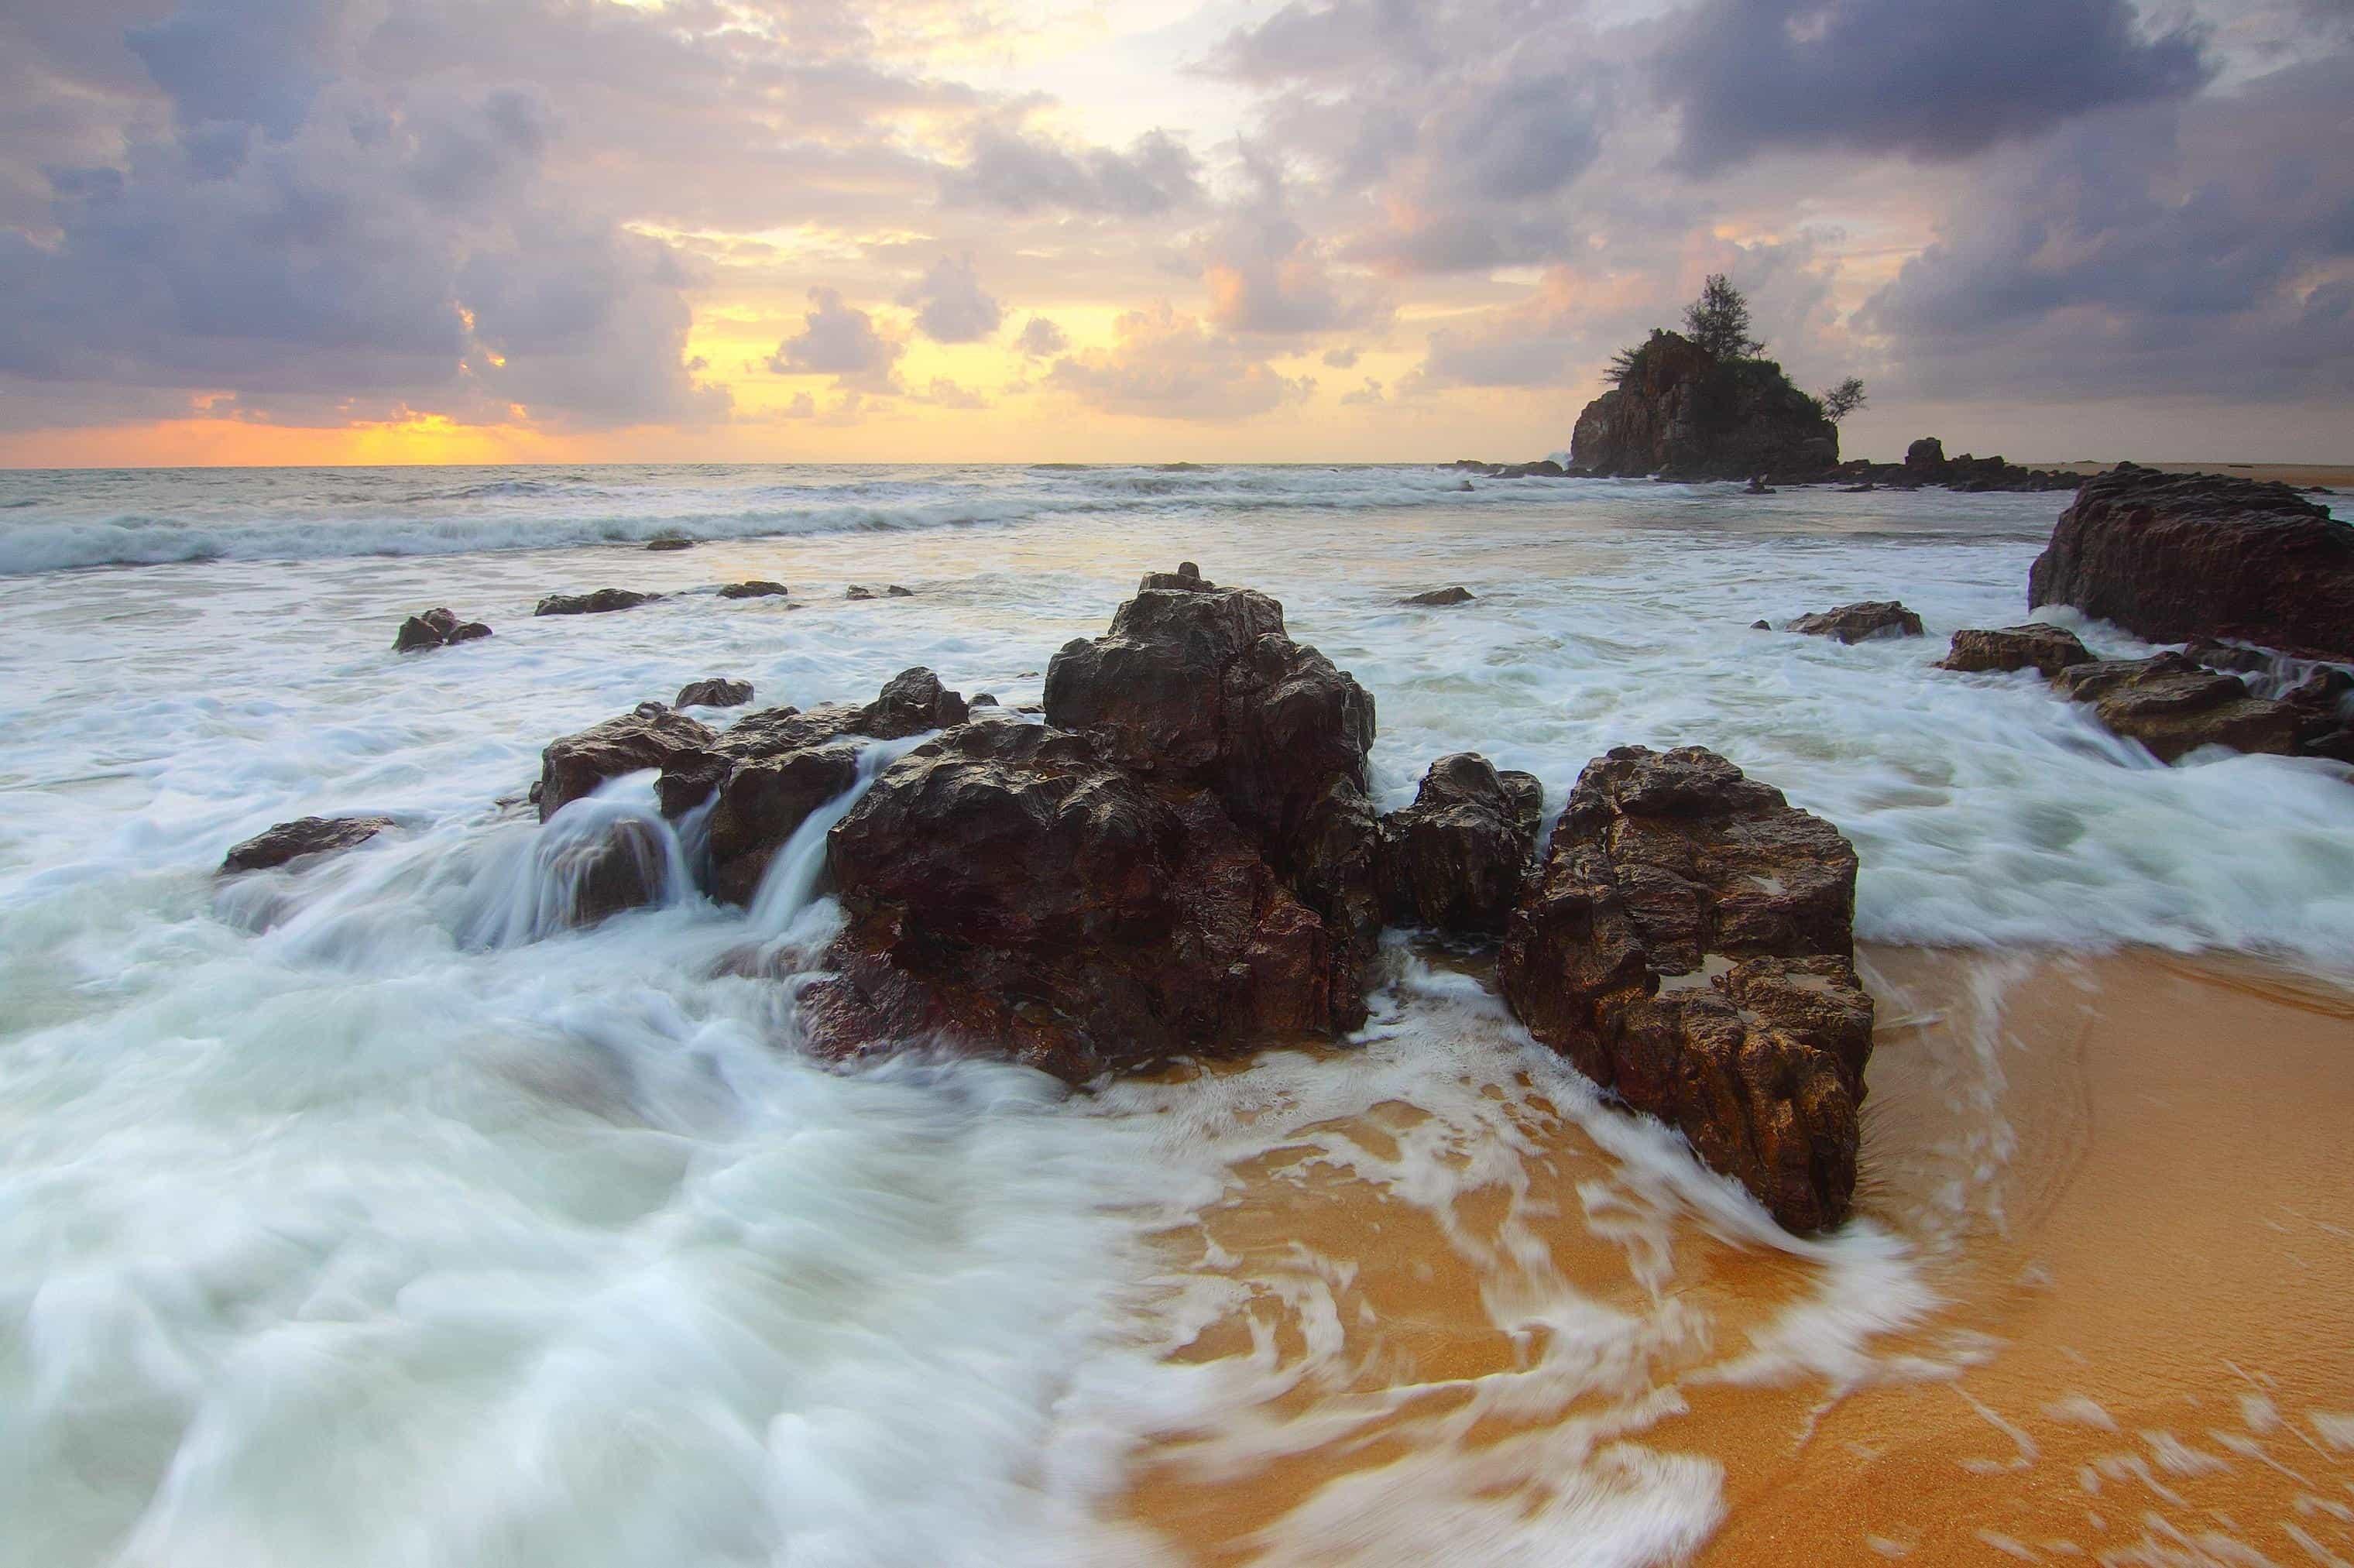 Wallpaper Of Water Fall Free Picture Water Sunset Beach Sea Ocean Seashore